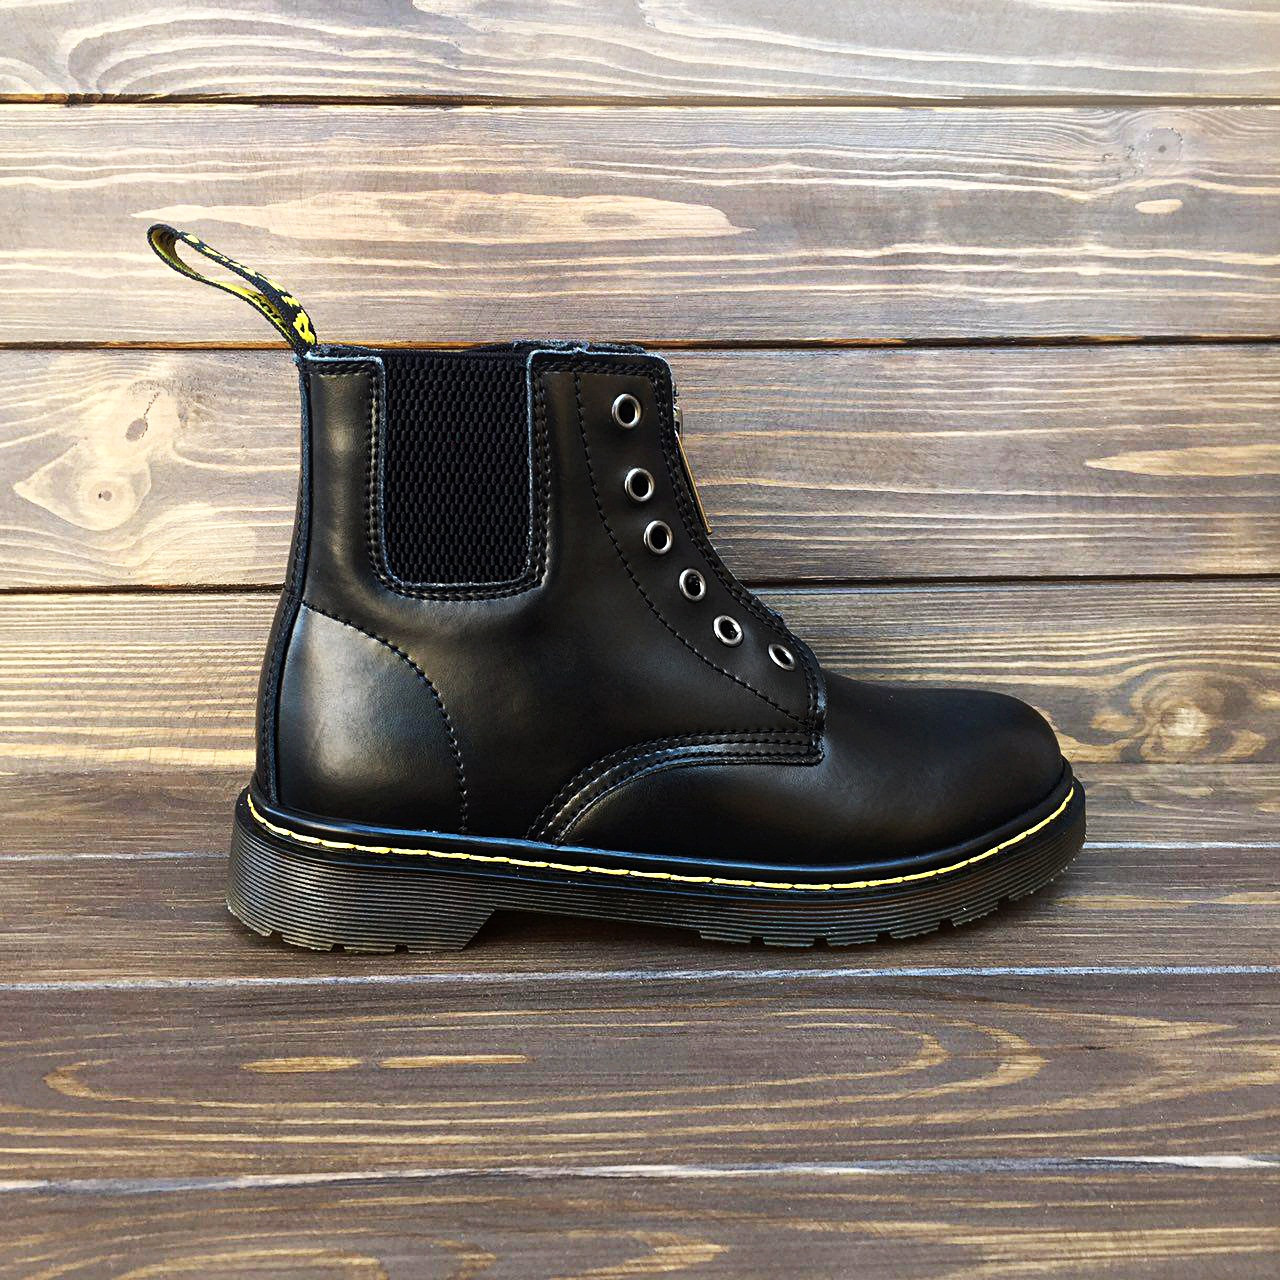 8192a6b8 Мужские кожаные ботинки/челси в стиле Dr. Martens 101 Gusset -  Интернет-магазин